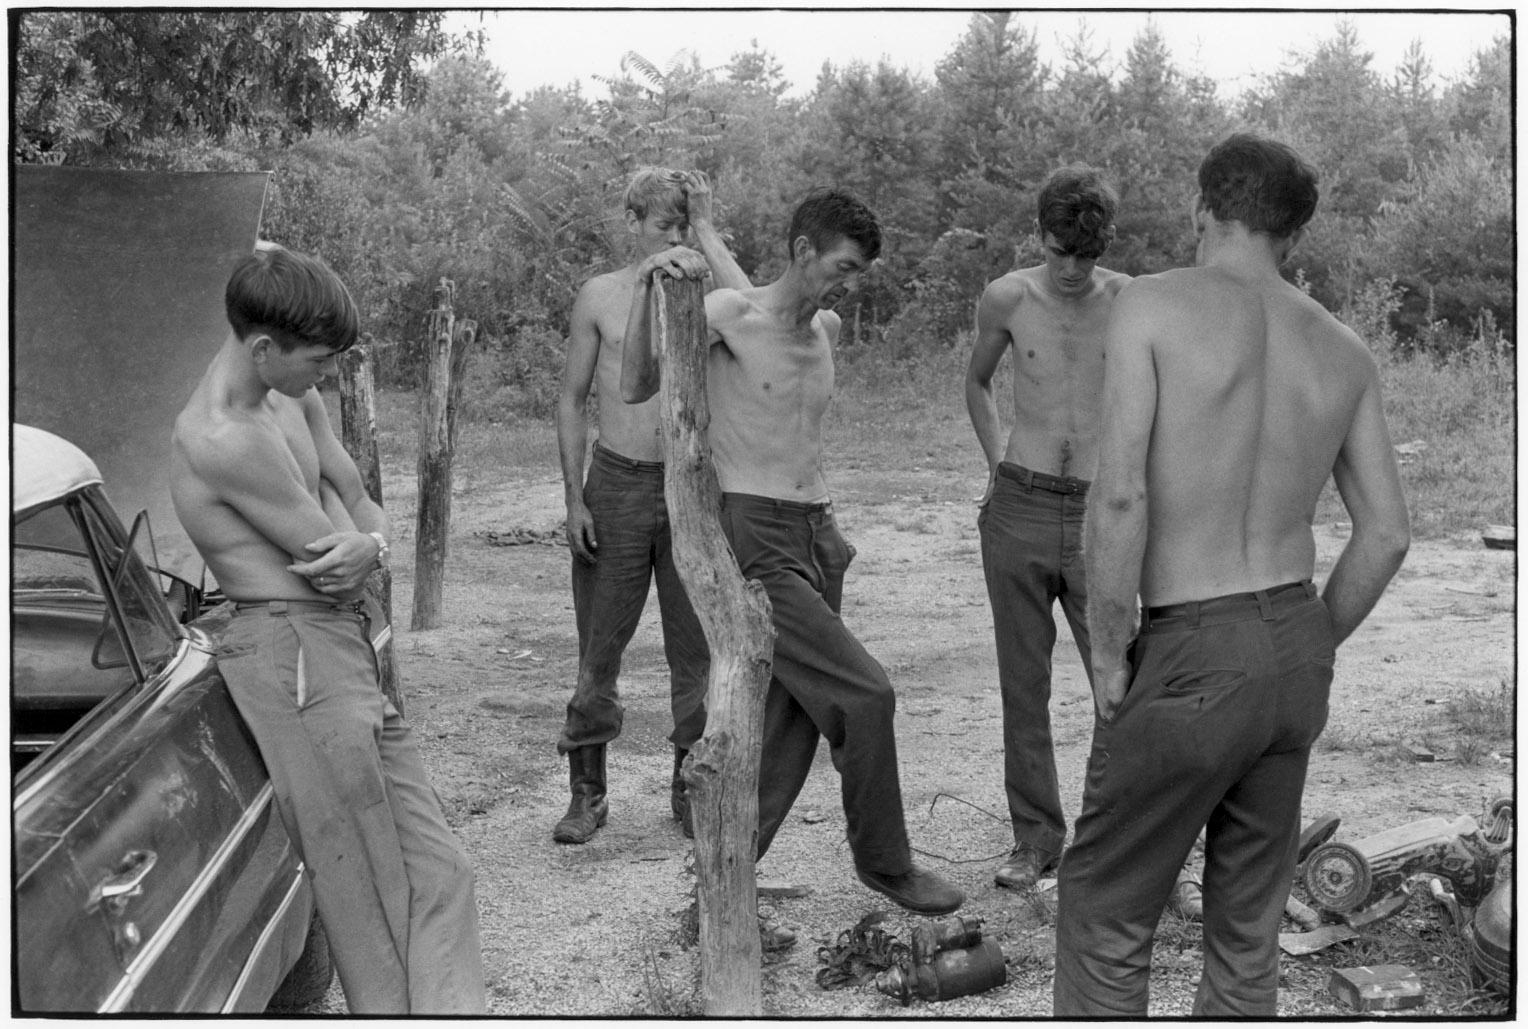 """Men without shirts; kicking car starter on the ground"" - William Gedney, 1972"